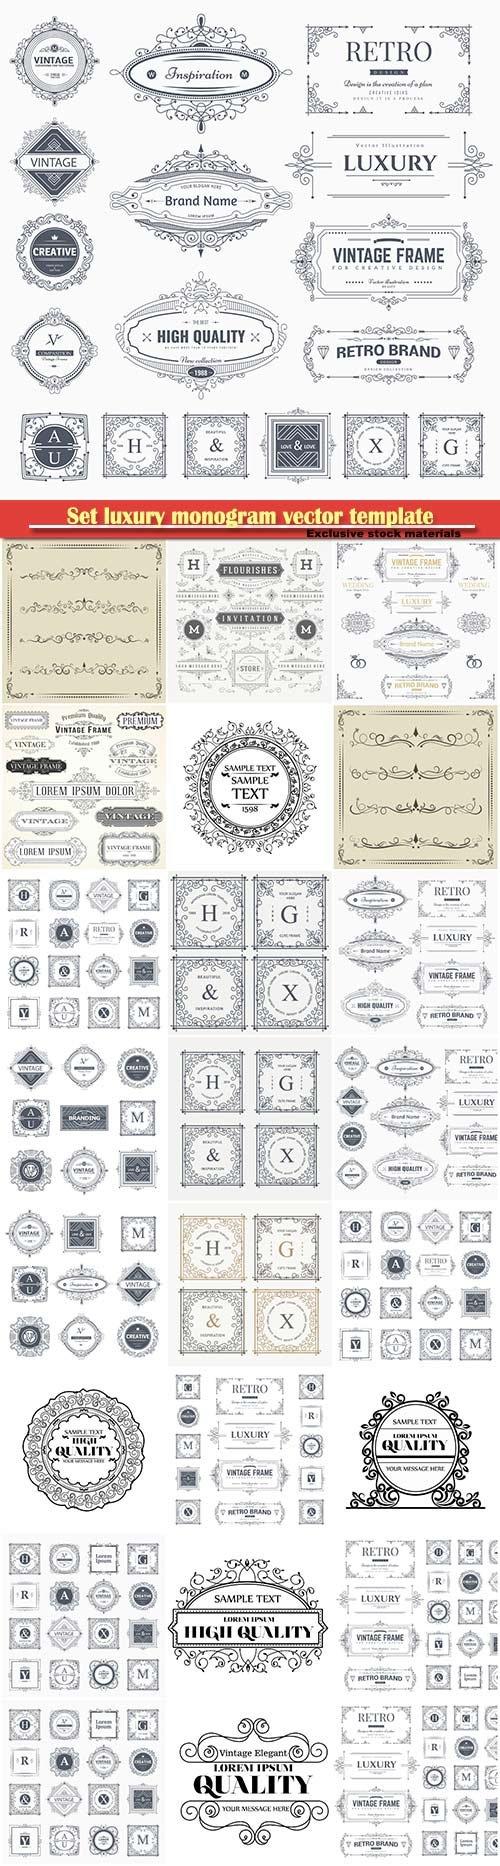 Set luxury monogram vector template, logos, badges, symbols # 9